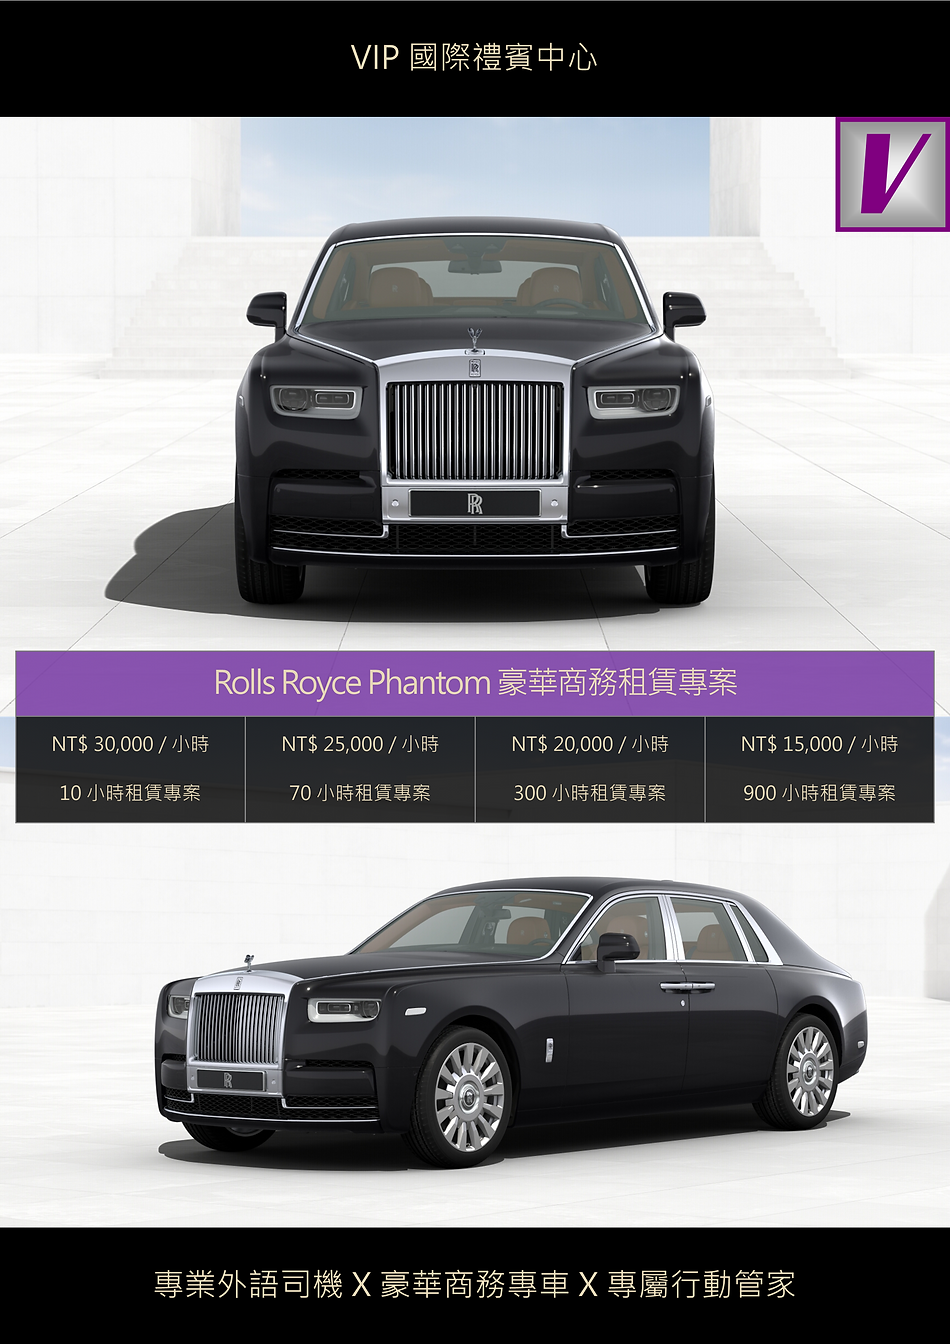 VIP國際禮賓中心 ROLLS ROYCE PHANTOM BLACK 豪華商務租賃專案 DM.png